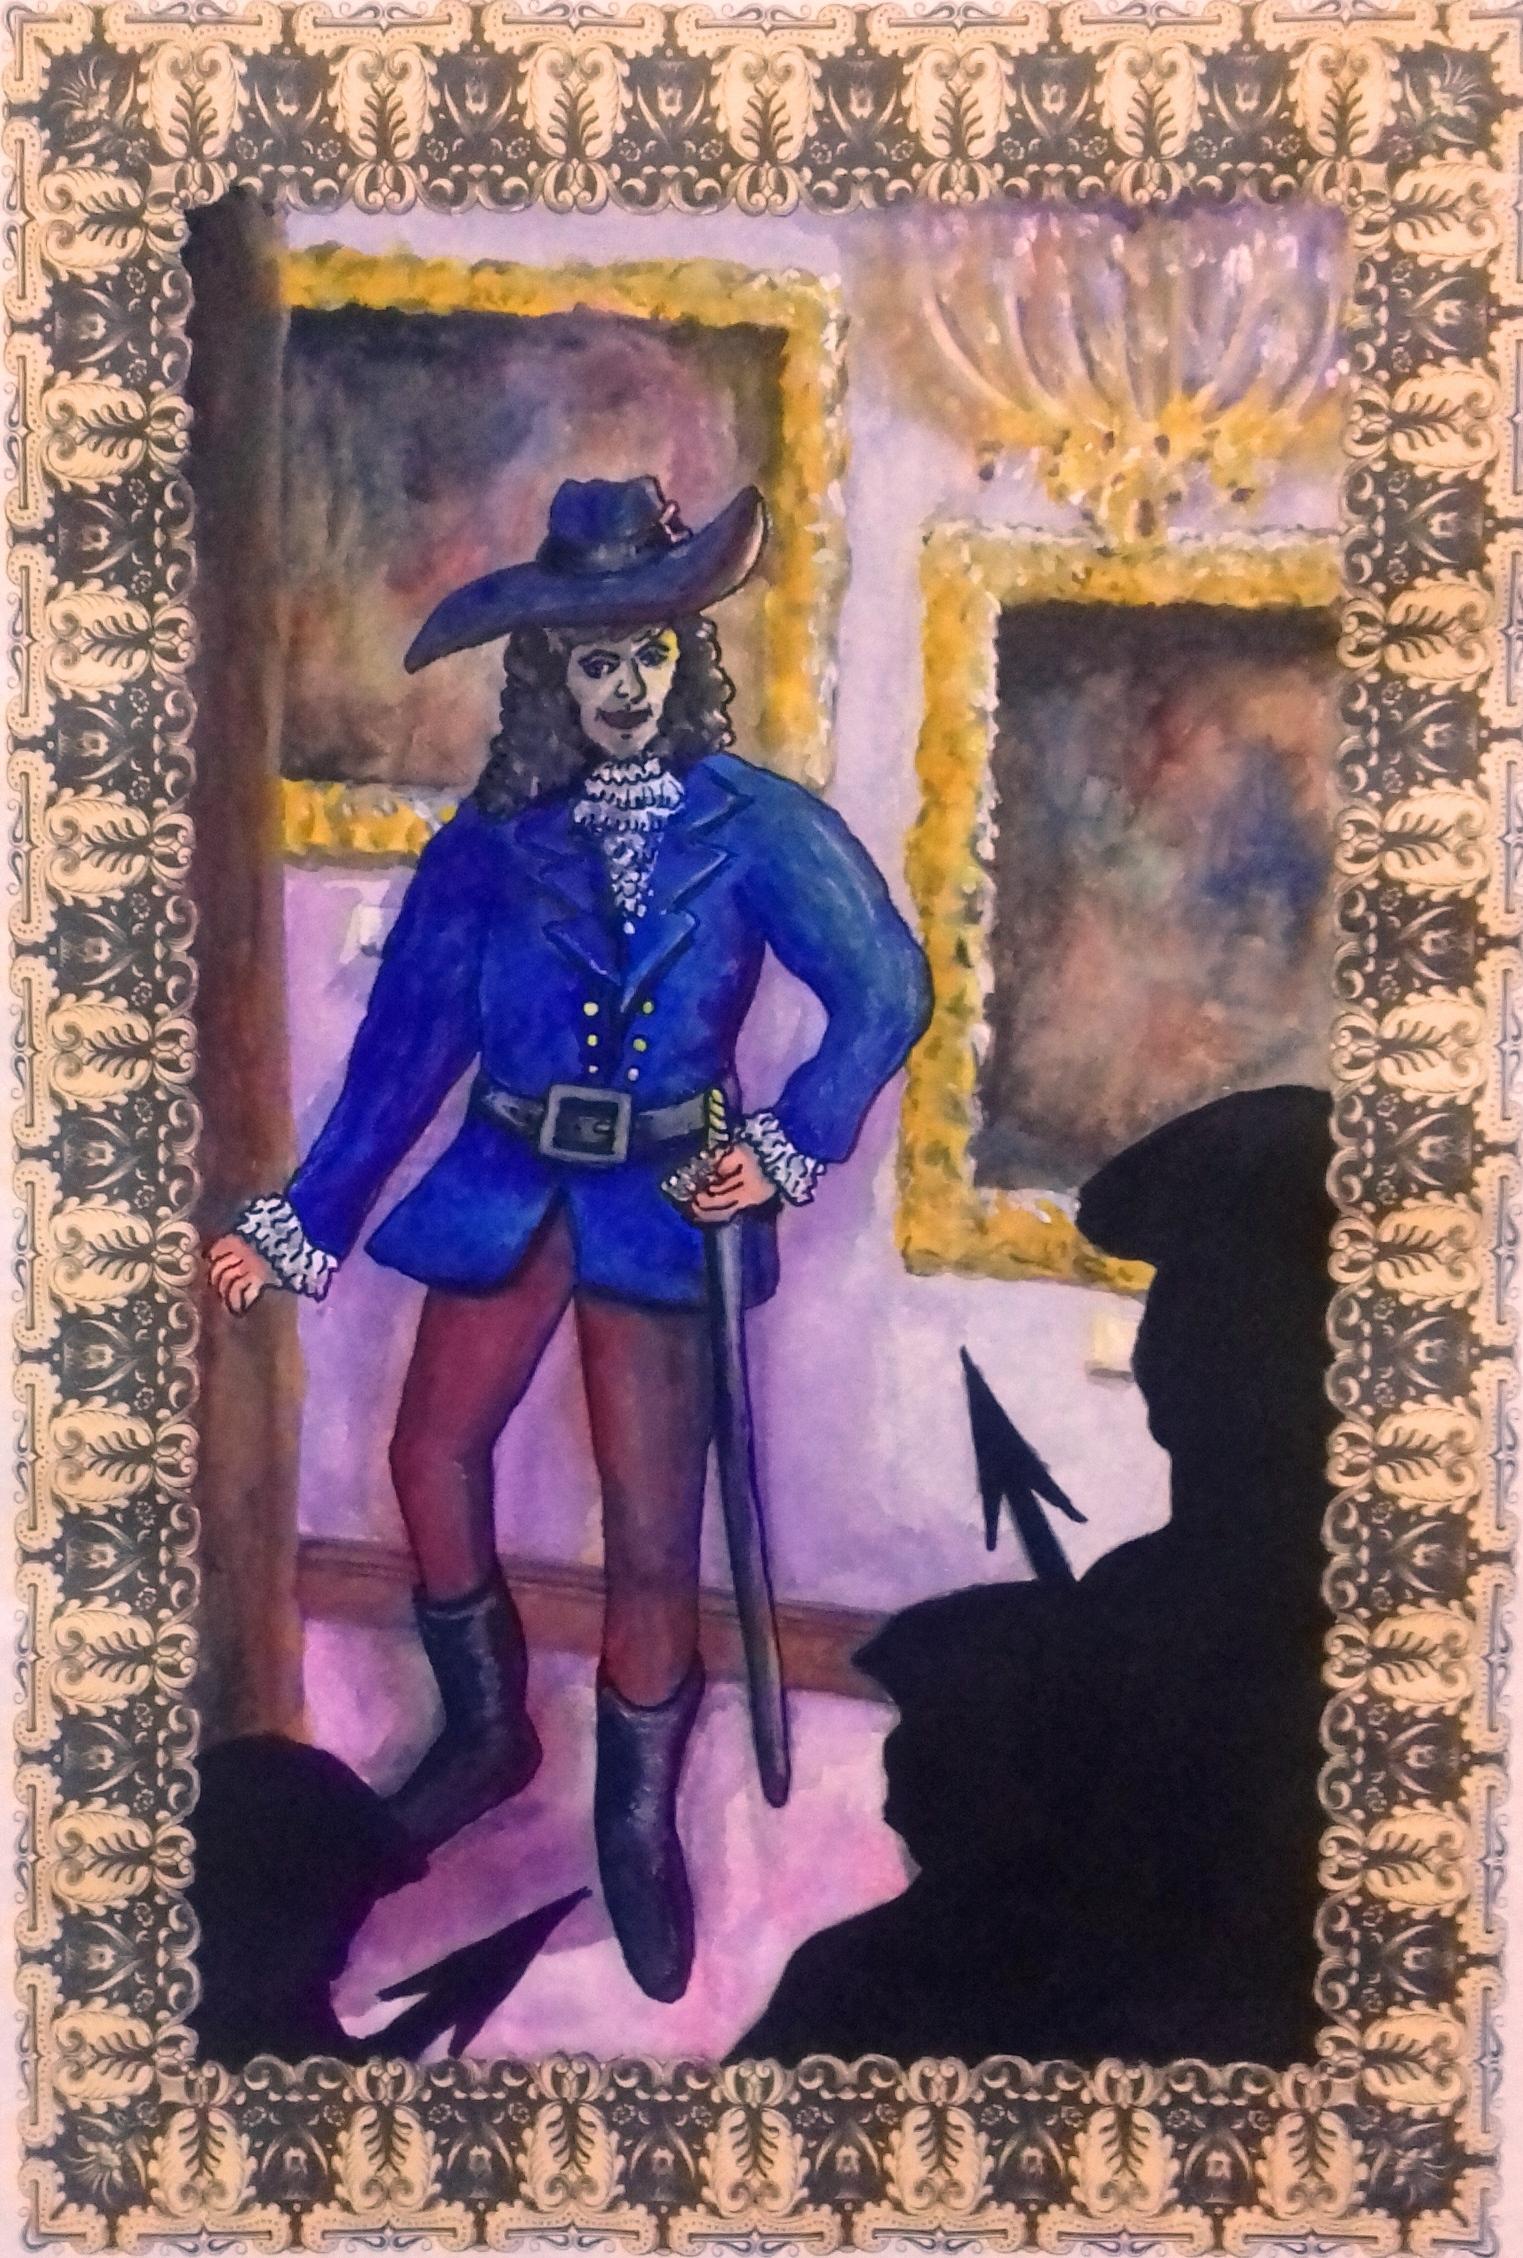 cornered cavalier